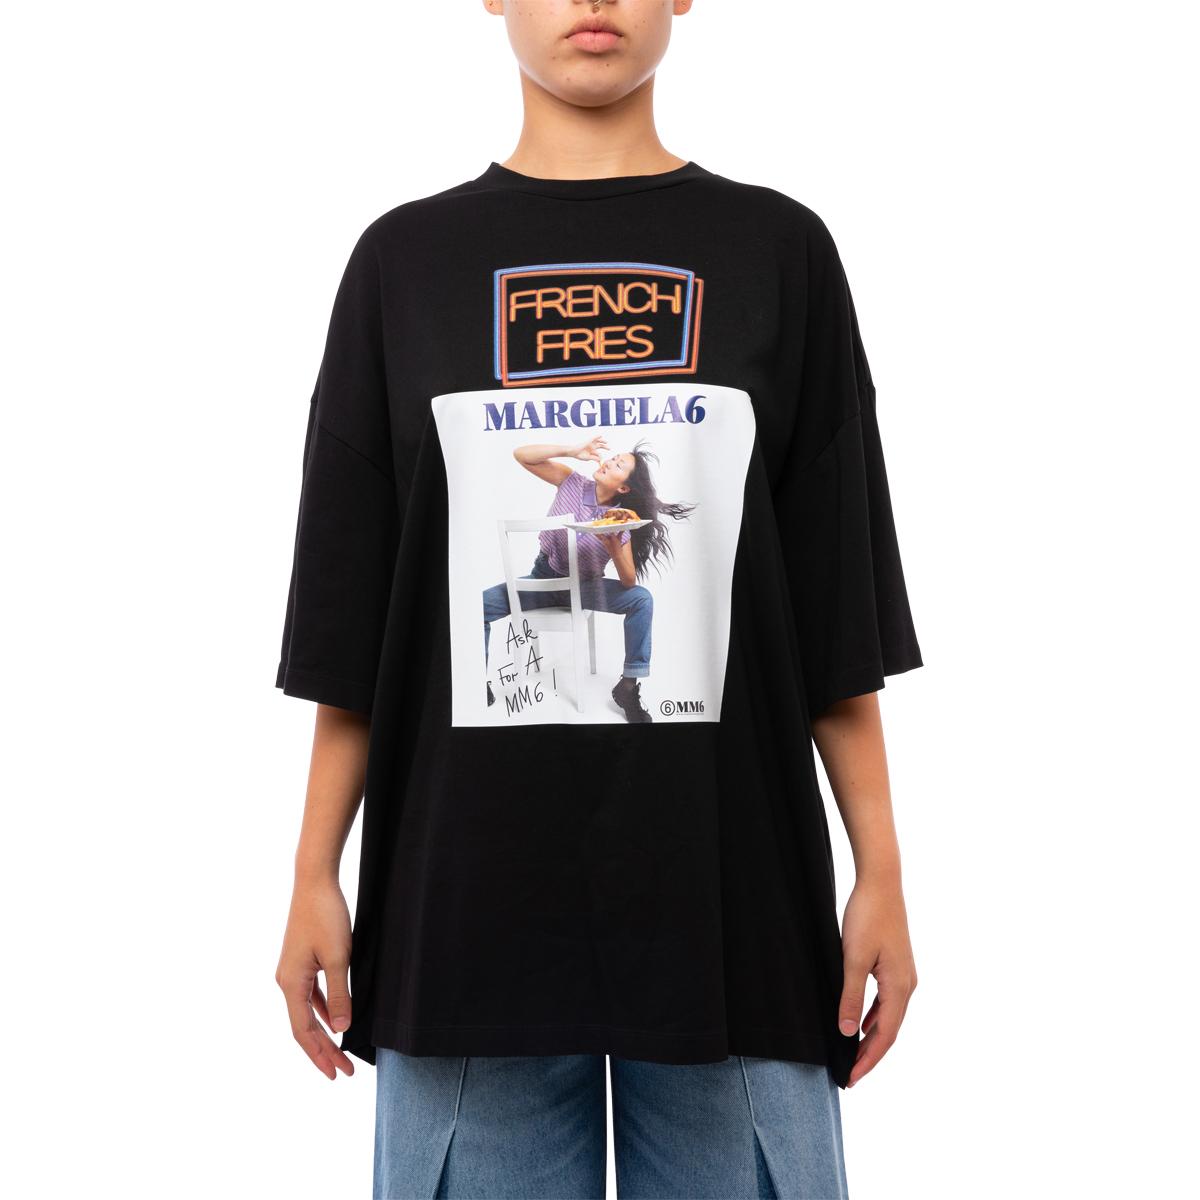 MM6 Maison Margiela French Fries T-Shirt